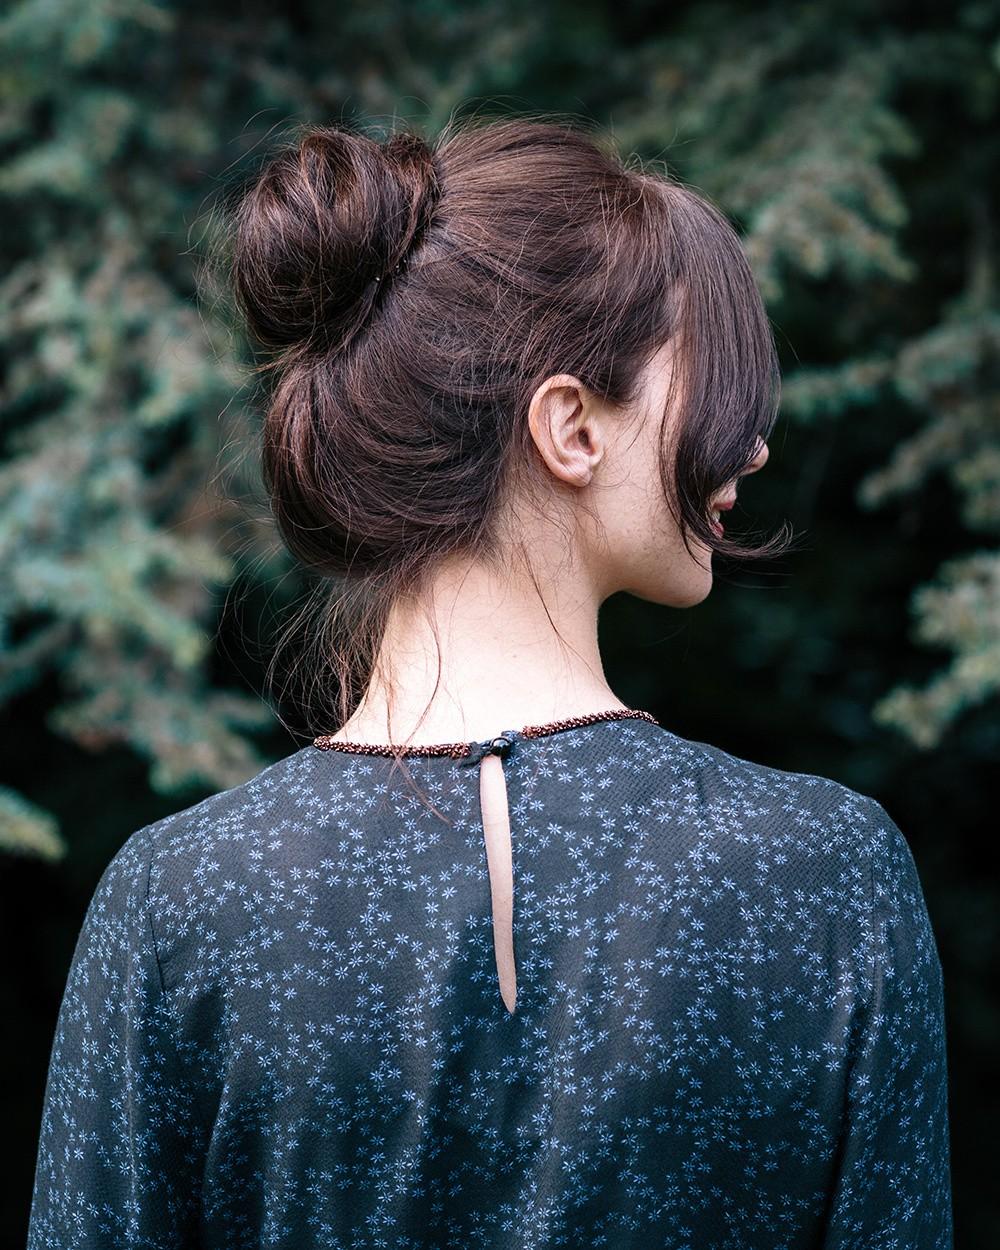 Iris Top with Embellished Neckline